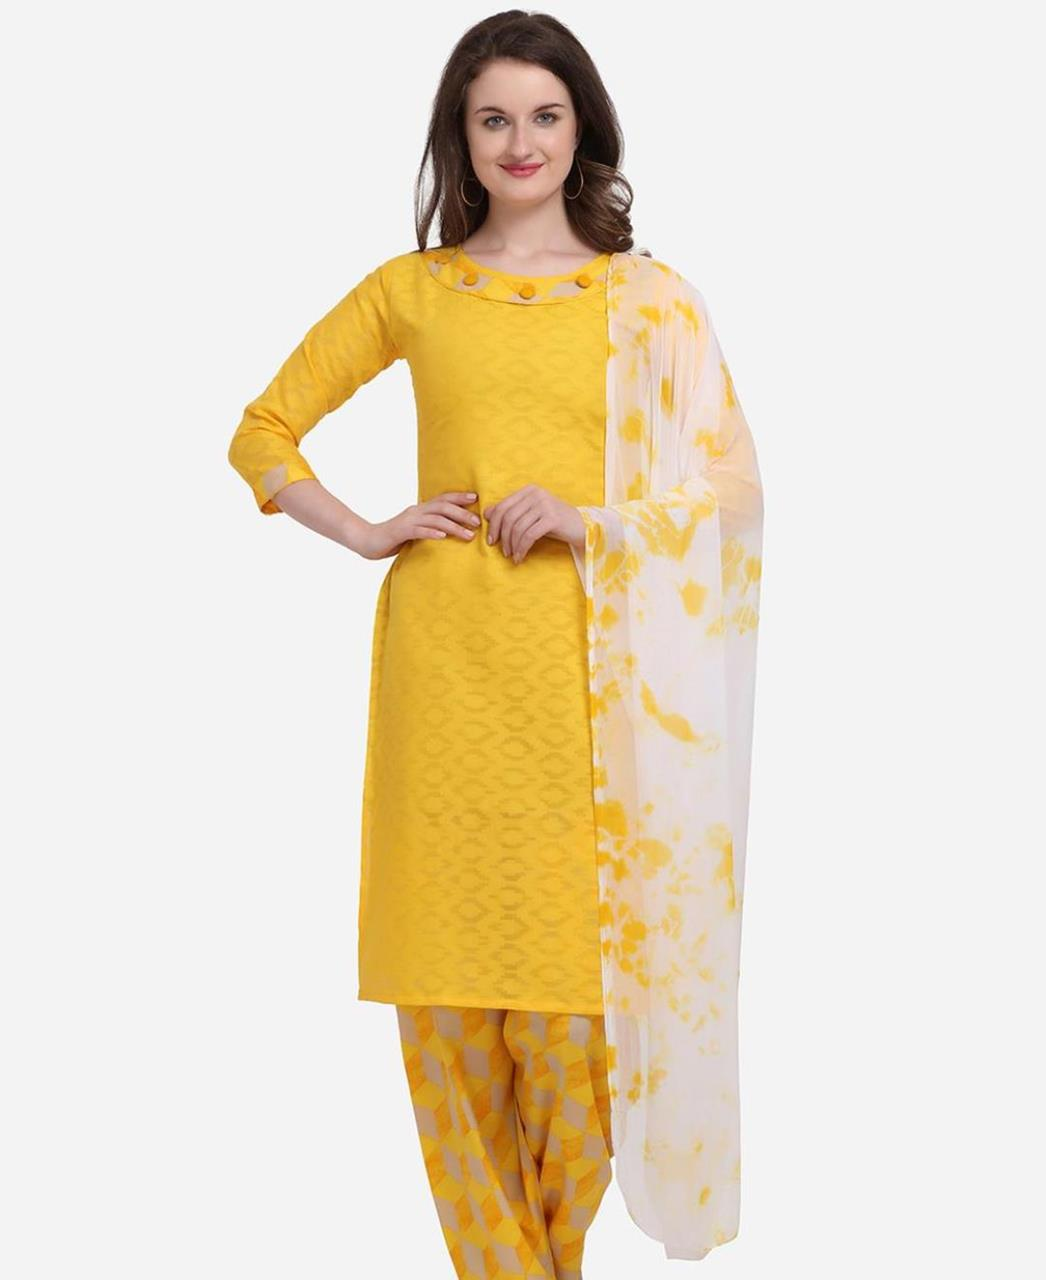 Embroidered Cotton Patiyala Suit Salwar in Yellow